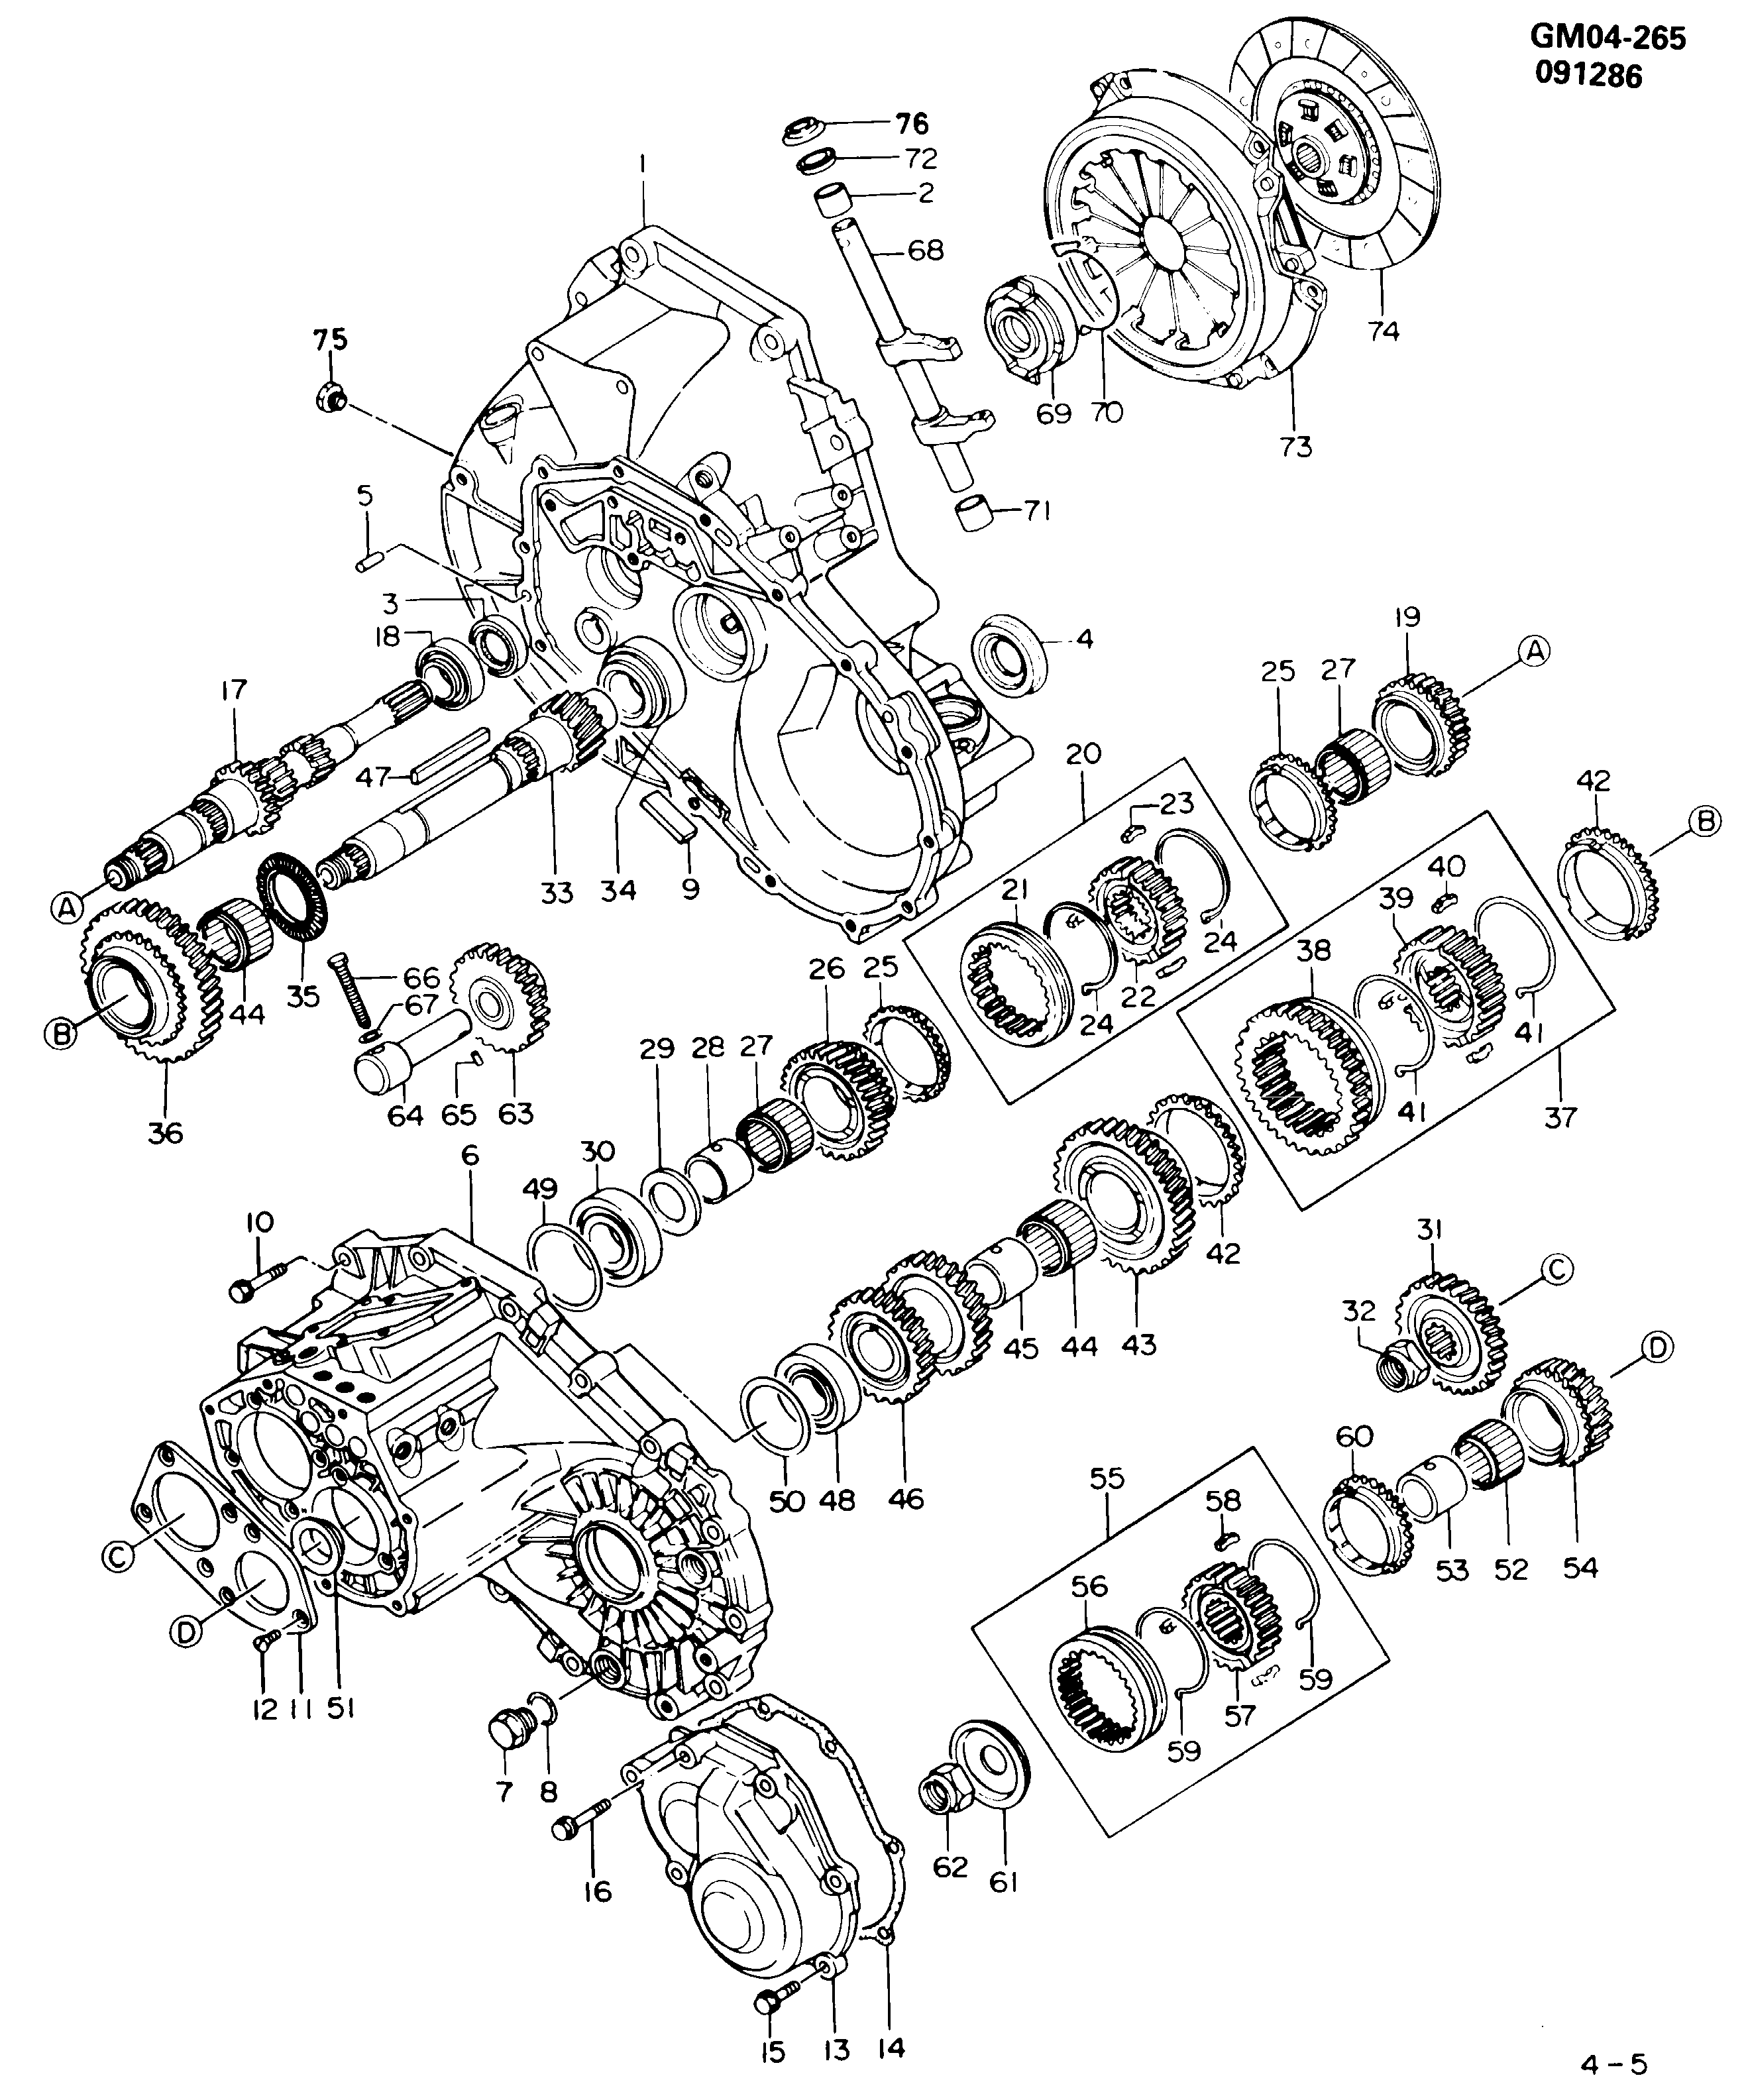 P 5-SPEED MANUAL TRANSAXLE PART 1 (MT2) (ISUZU)